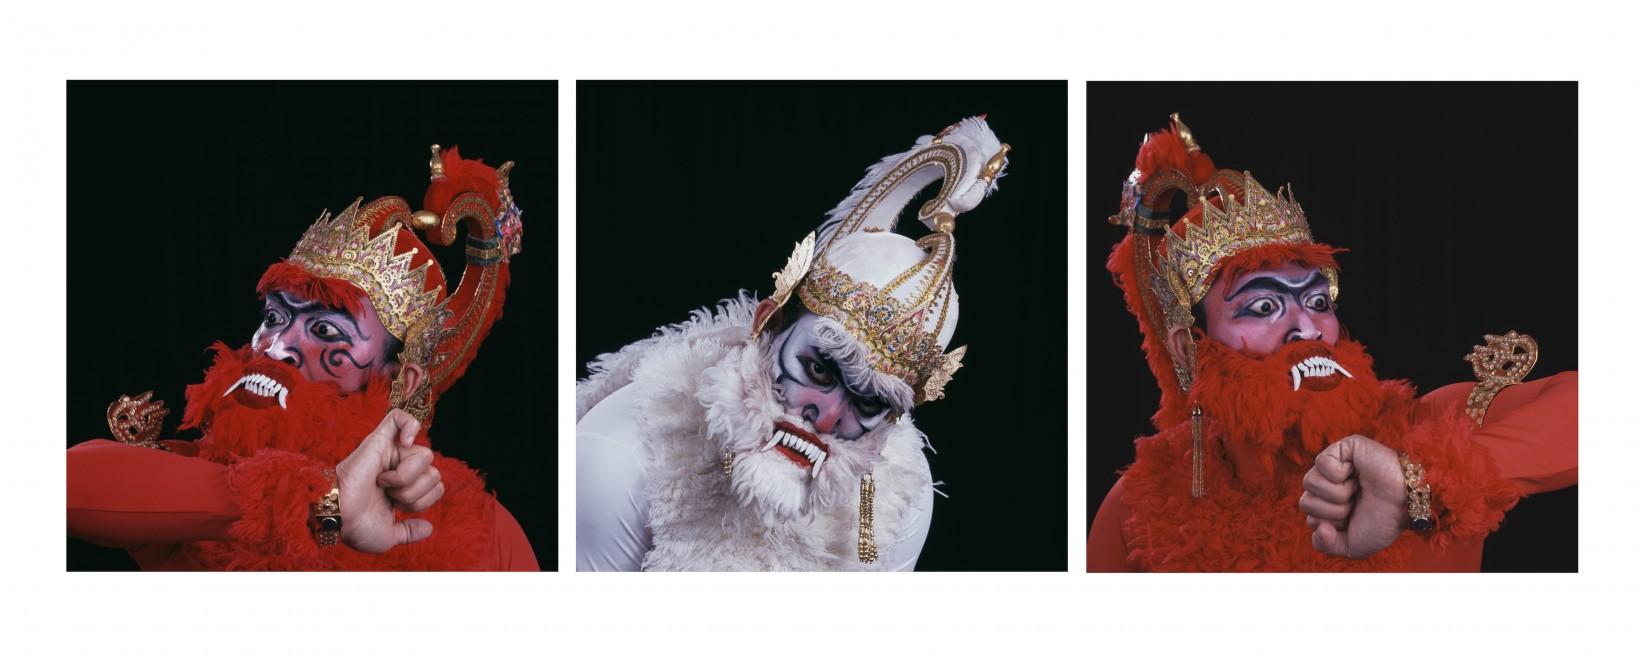 Adri Valery Wens, 'The Wanara', courtesy the artist and Kronenberg Wright Artists Projects, Sydney